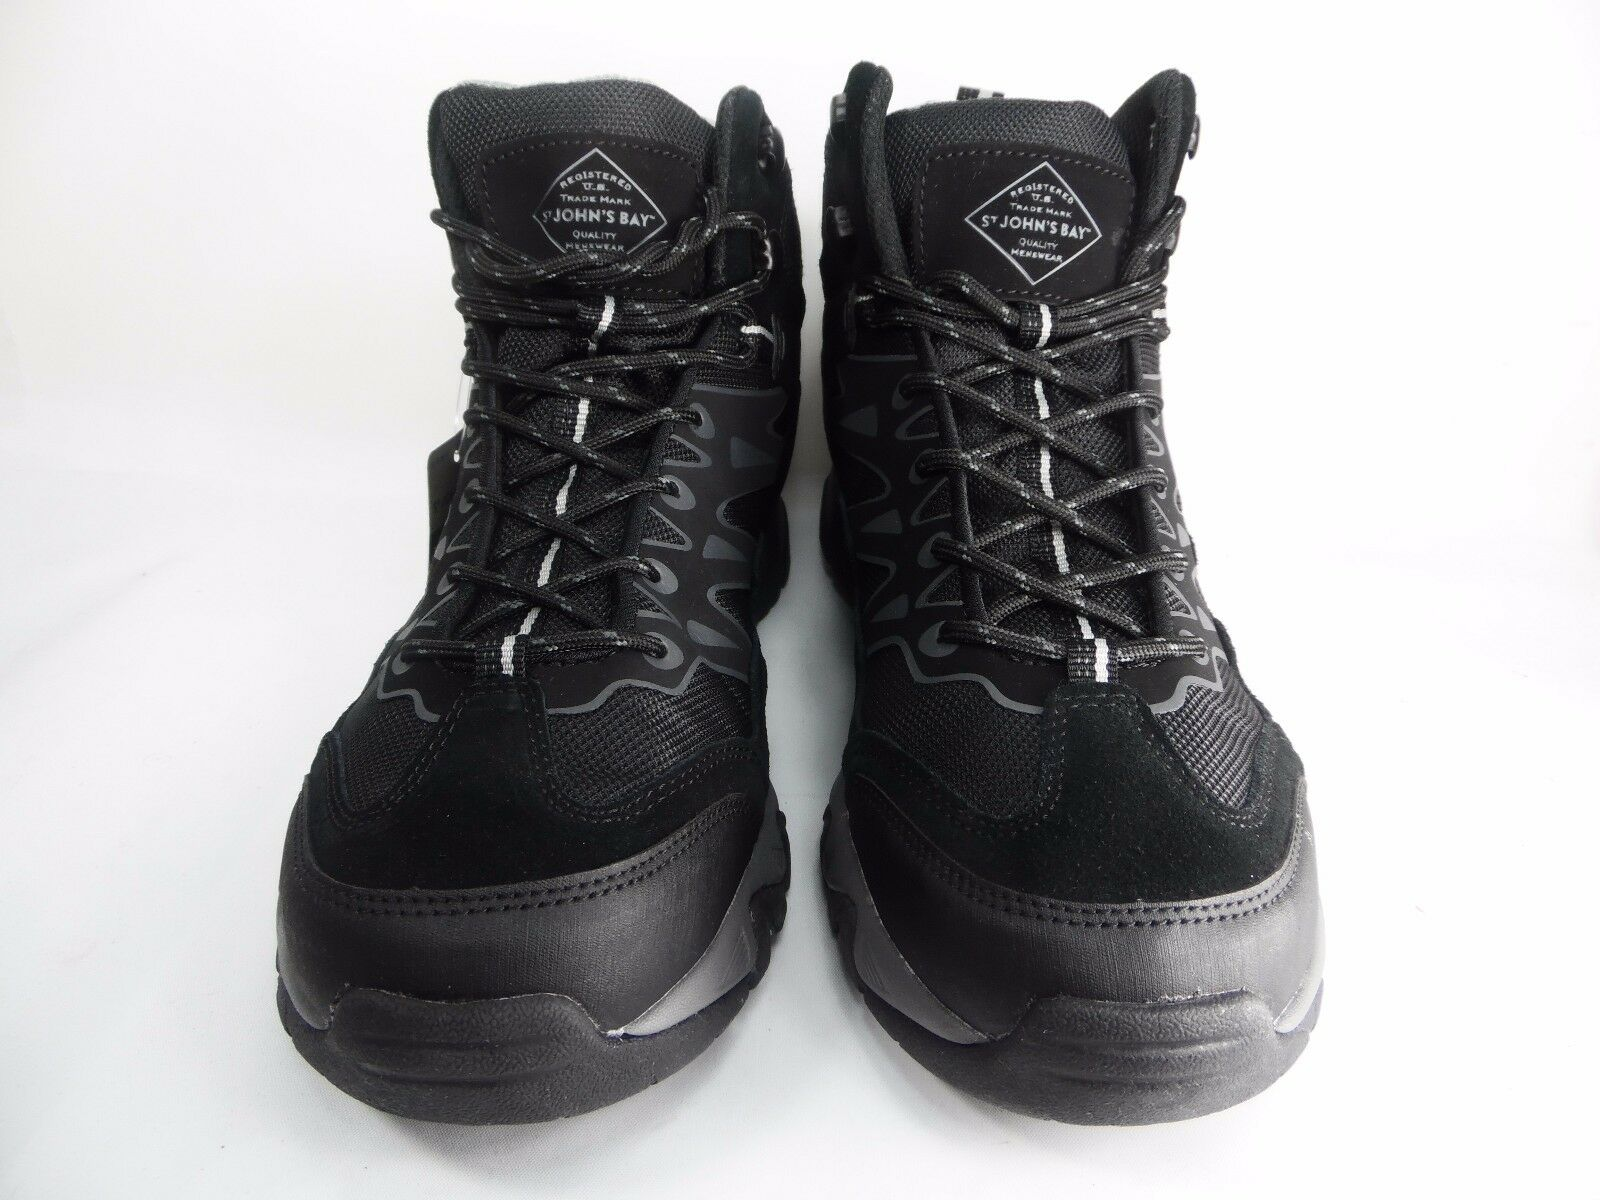 St. John's Bay Stillman Mens Hiking Boots  Black Size 9M